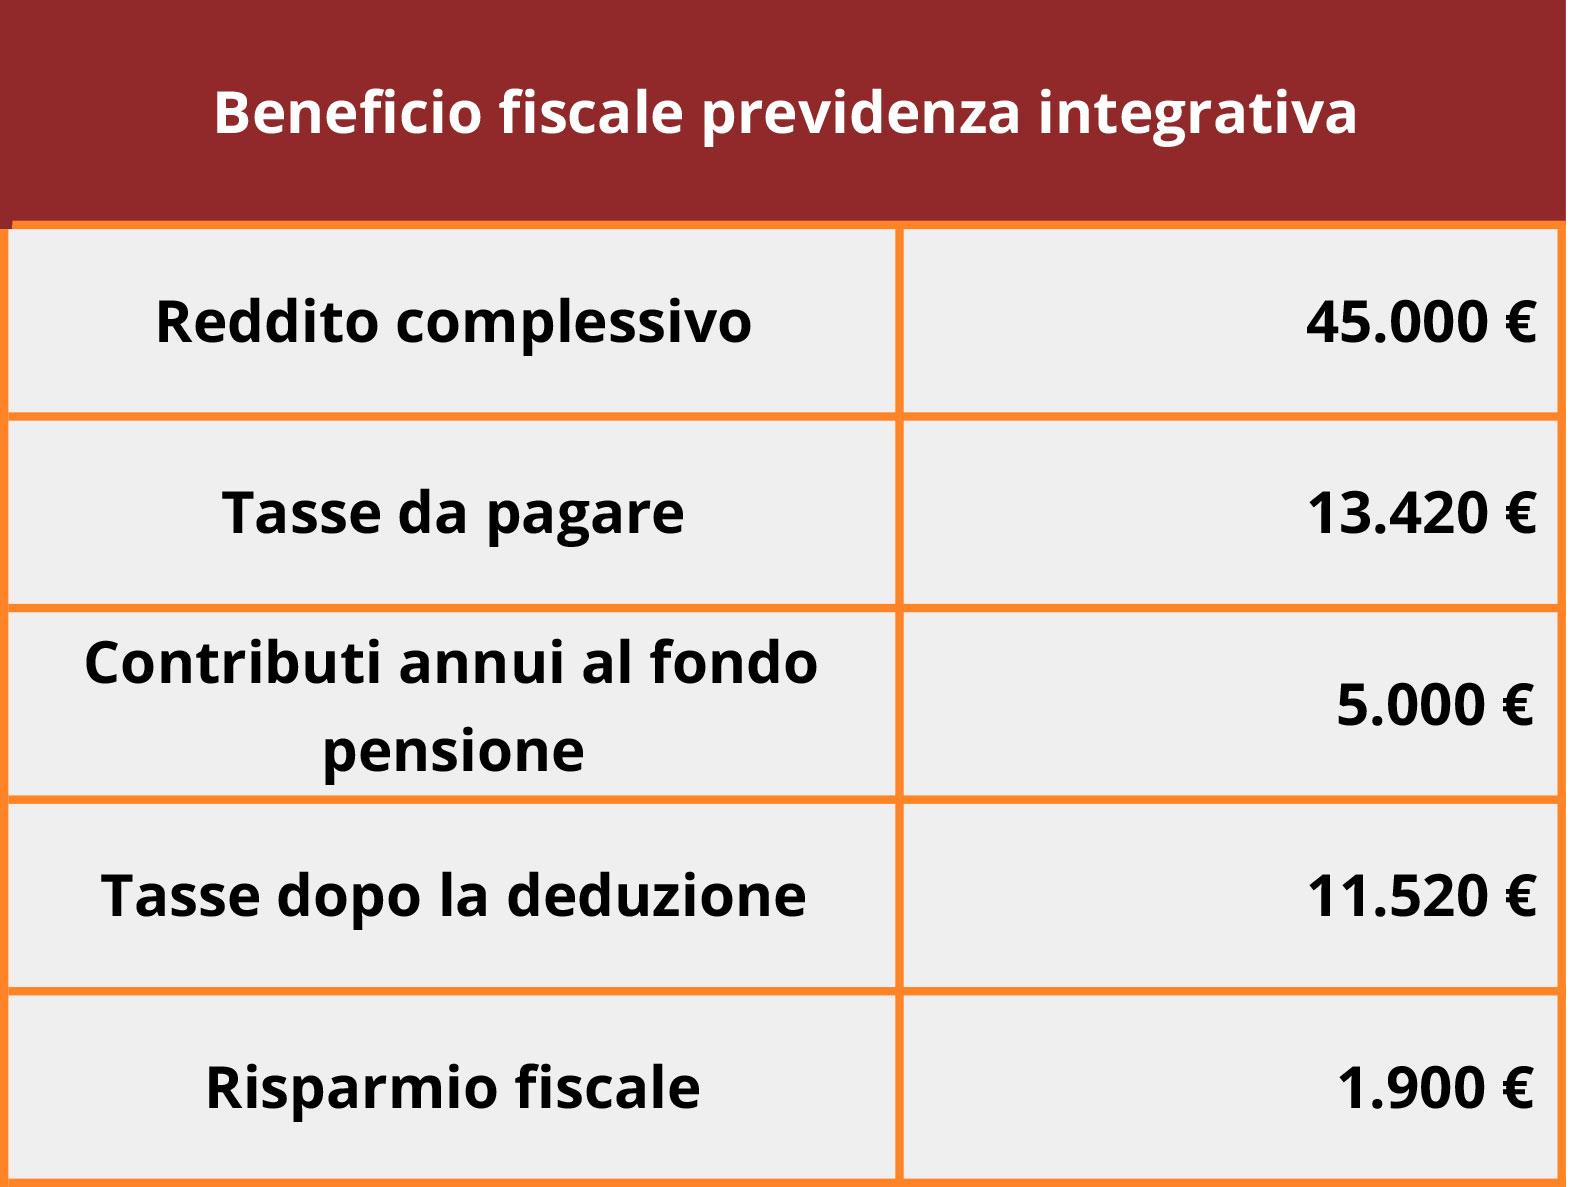 Beneficio_Fiscale_Franchising